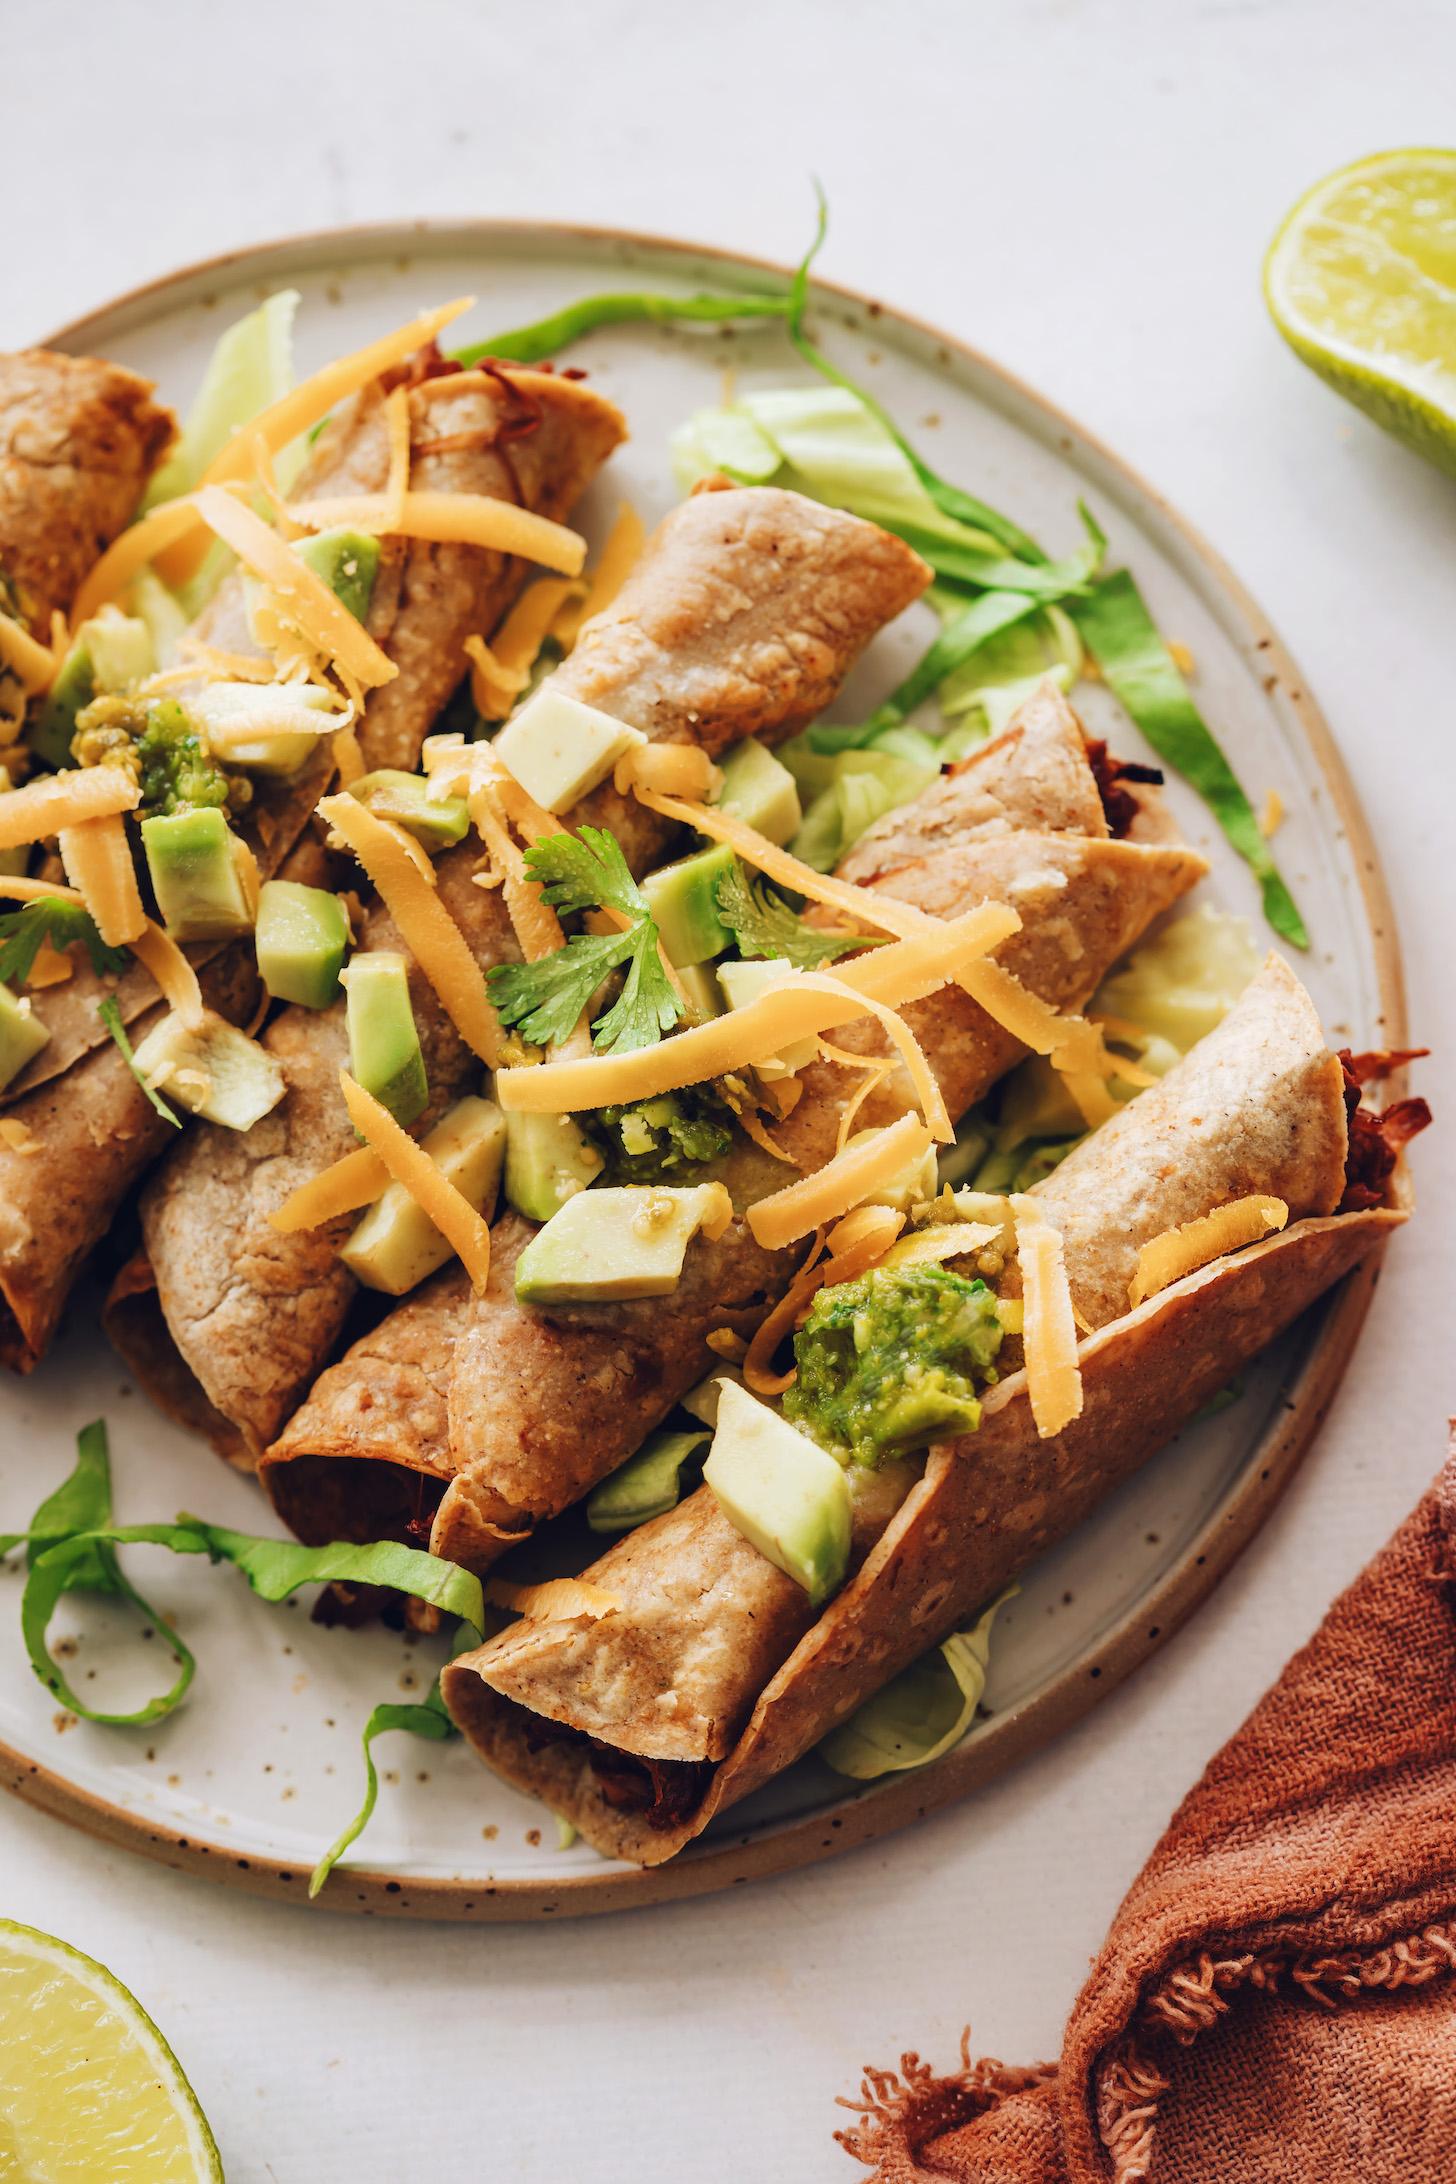 Plate of jackfruit taquitos with avocado, cilantro, lettuce, vegan cheddar, and tomatillo salsa